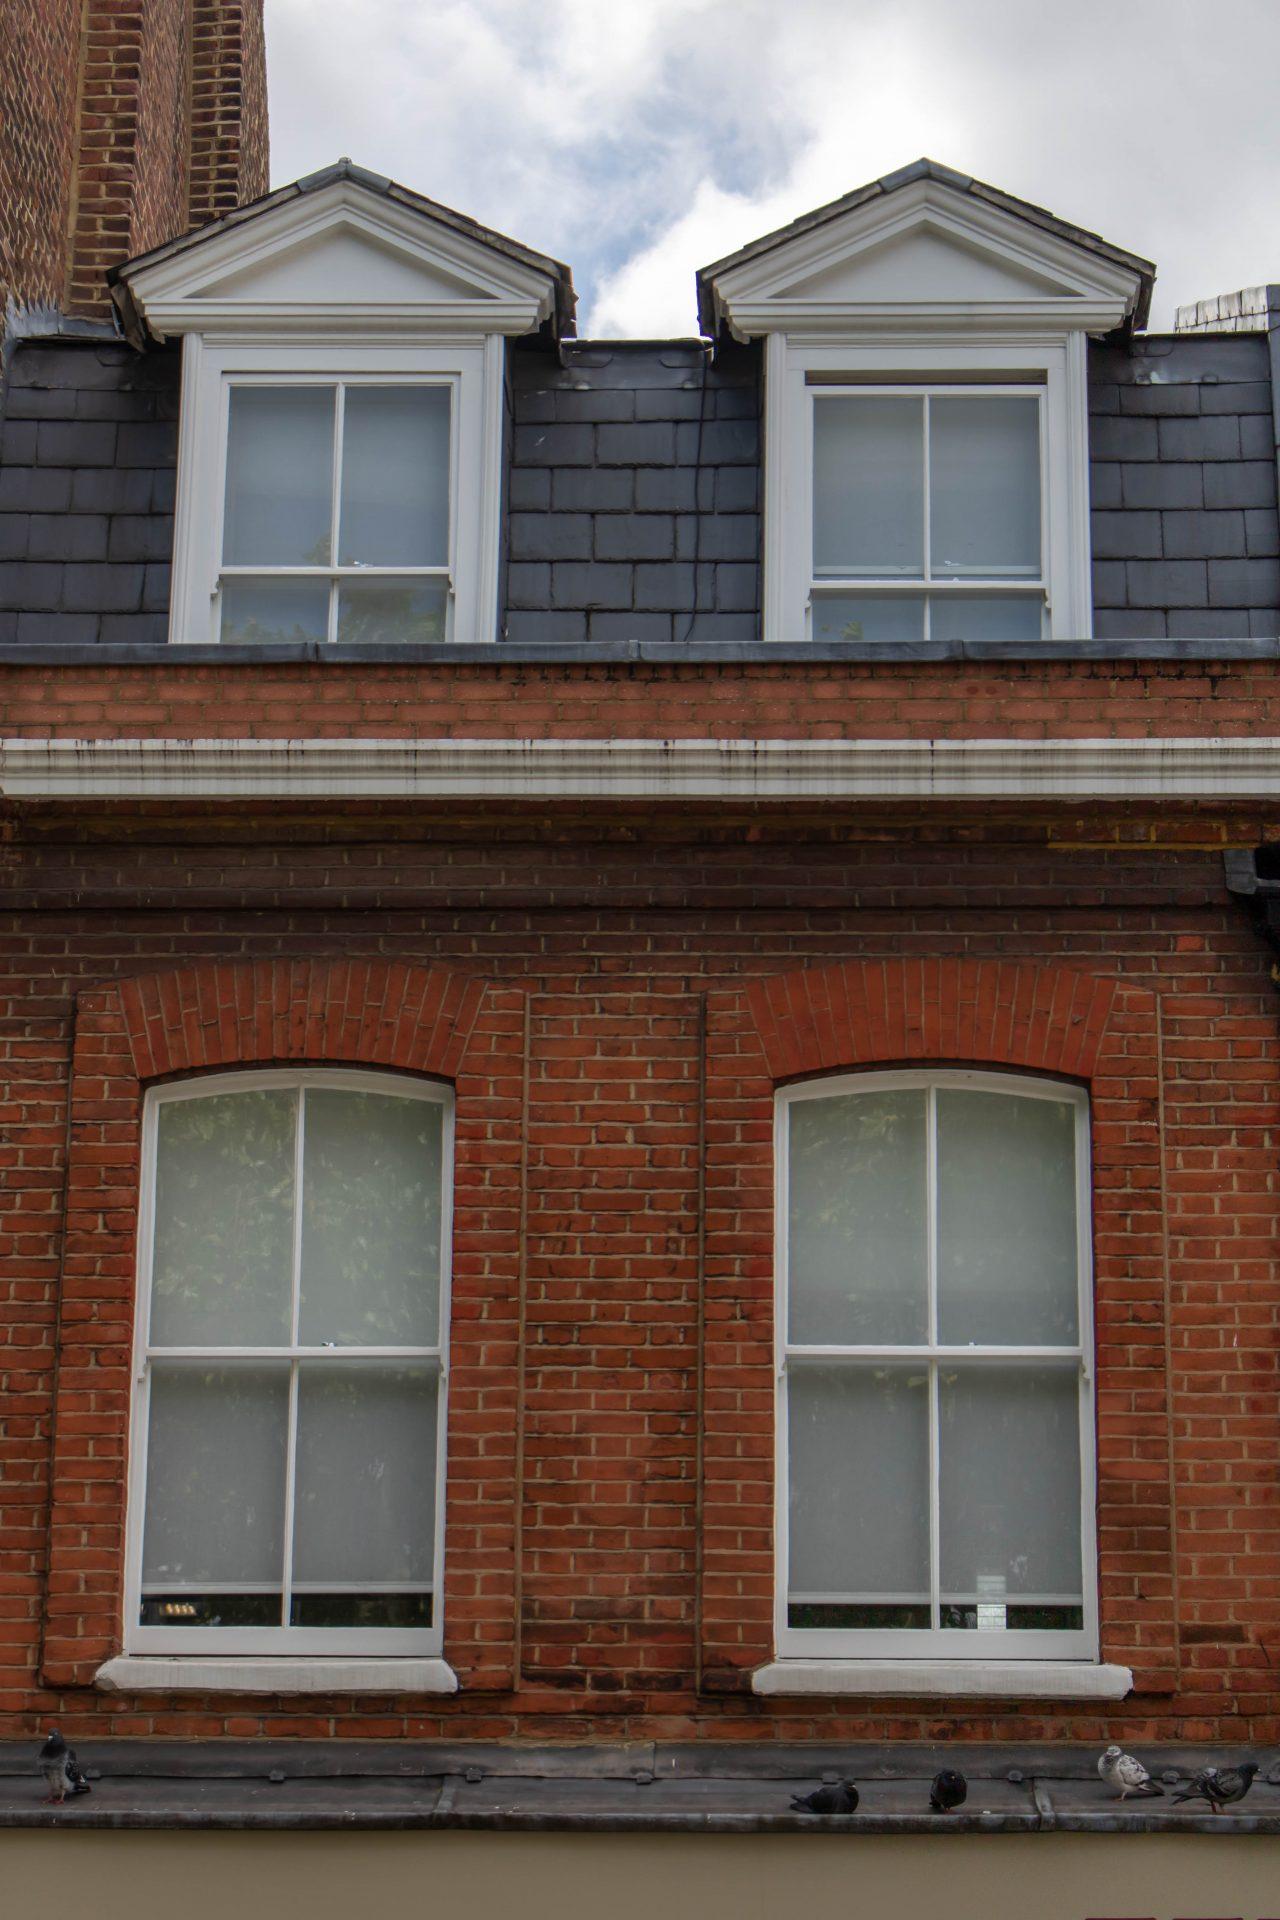 kandd window joinery above shopfront